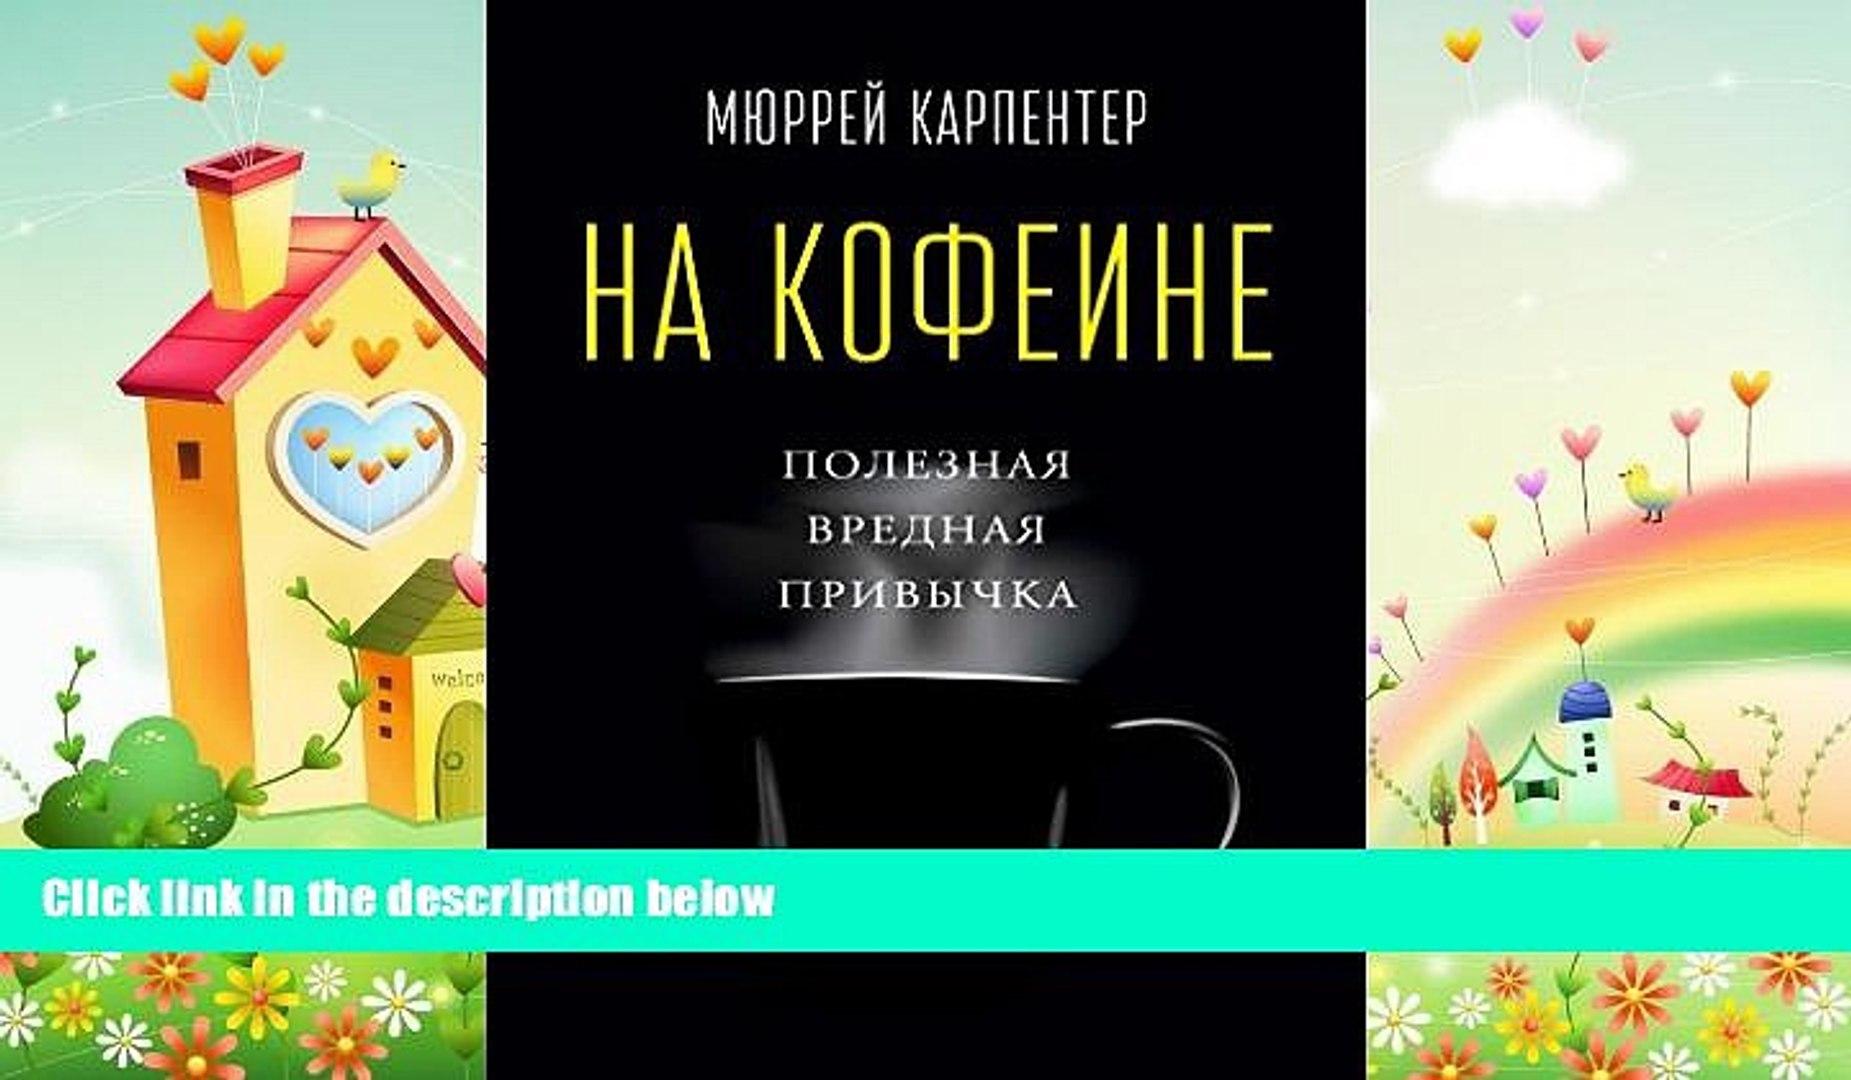 there is  �а кофеине: Полезна� вредна� привычка (Russian Edition)